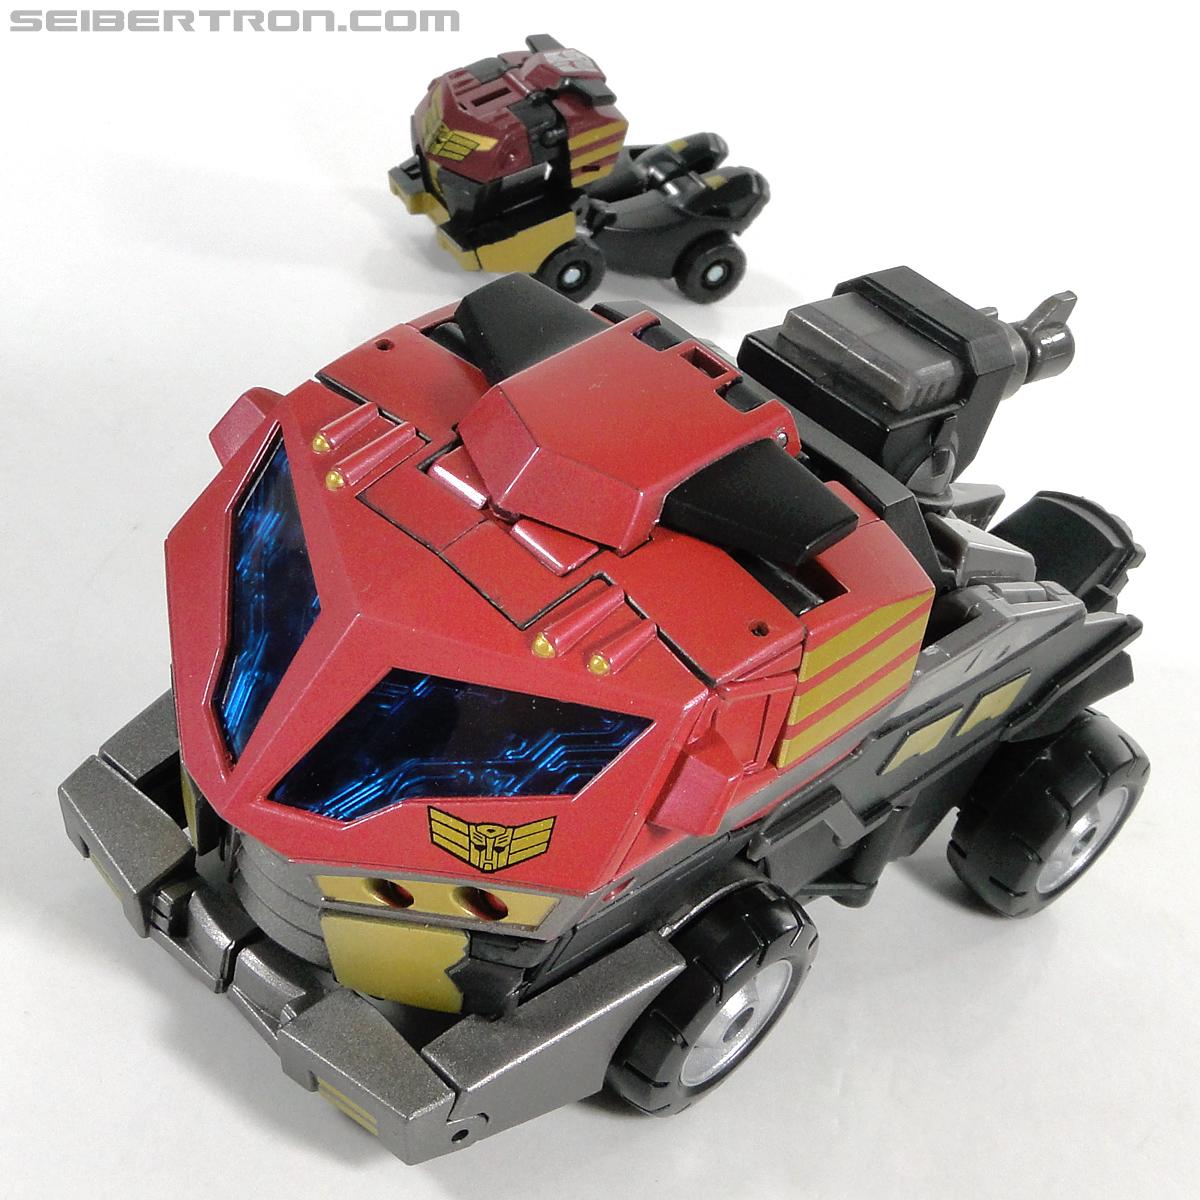 Transformers Animated Elite Guard Optimus Prime (Image #44 of 146)